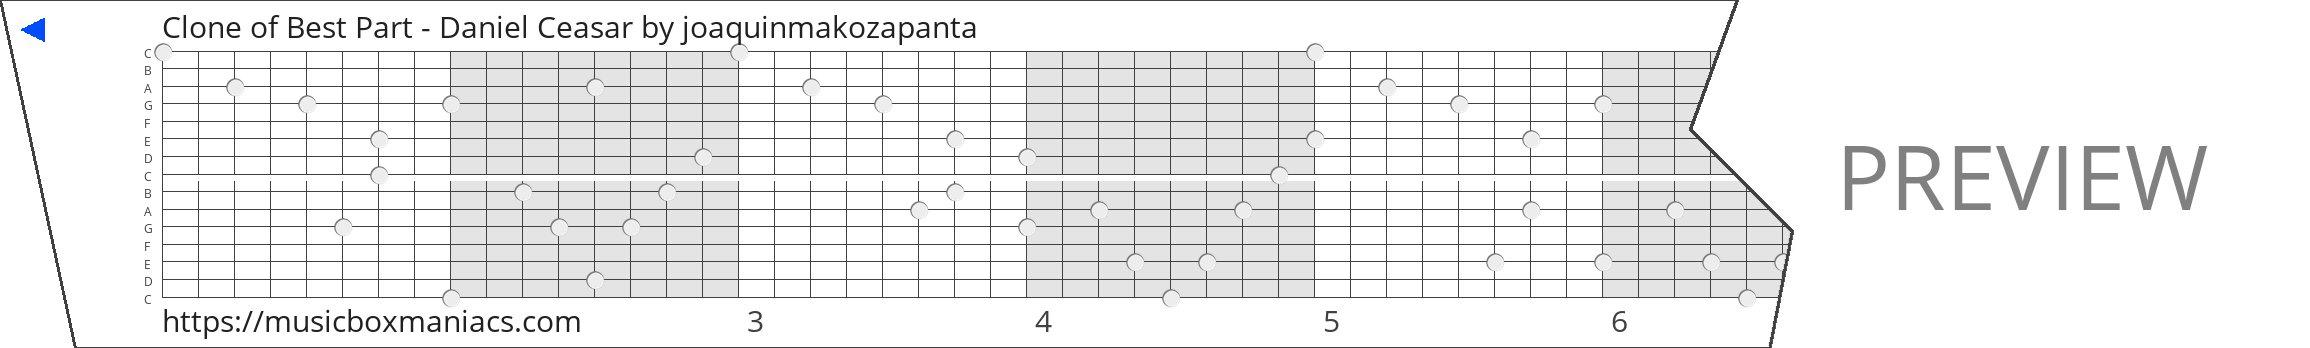 Clone of Best Part - Daniel Ceasar 15 note music box paper strip